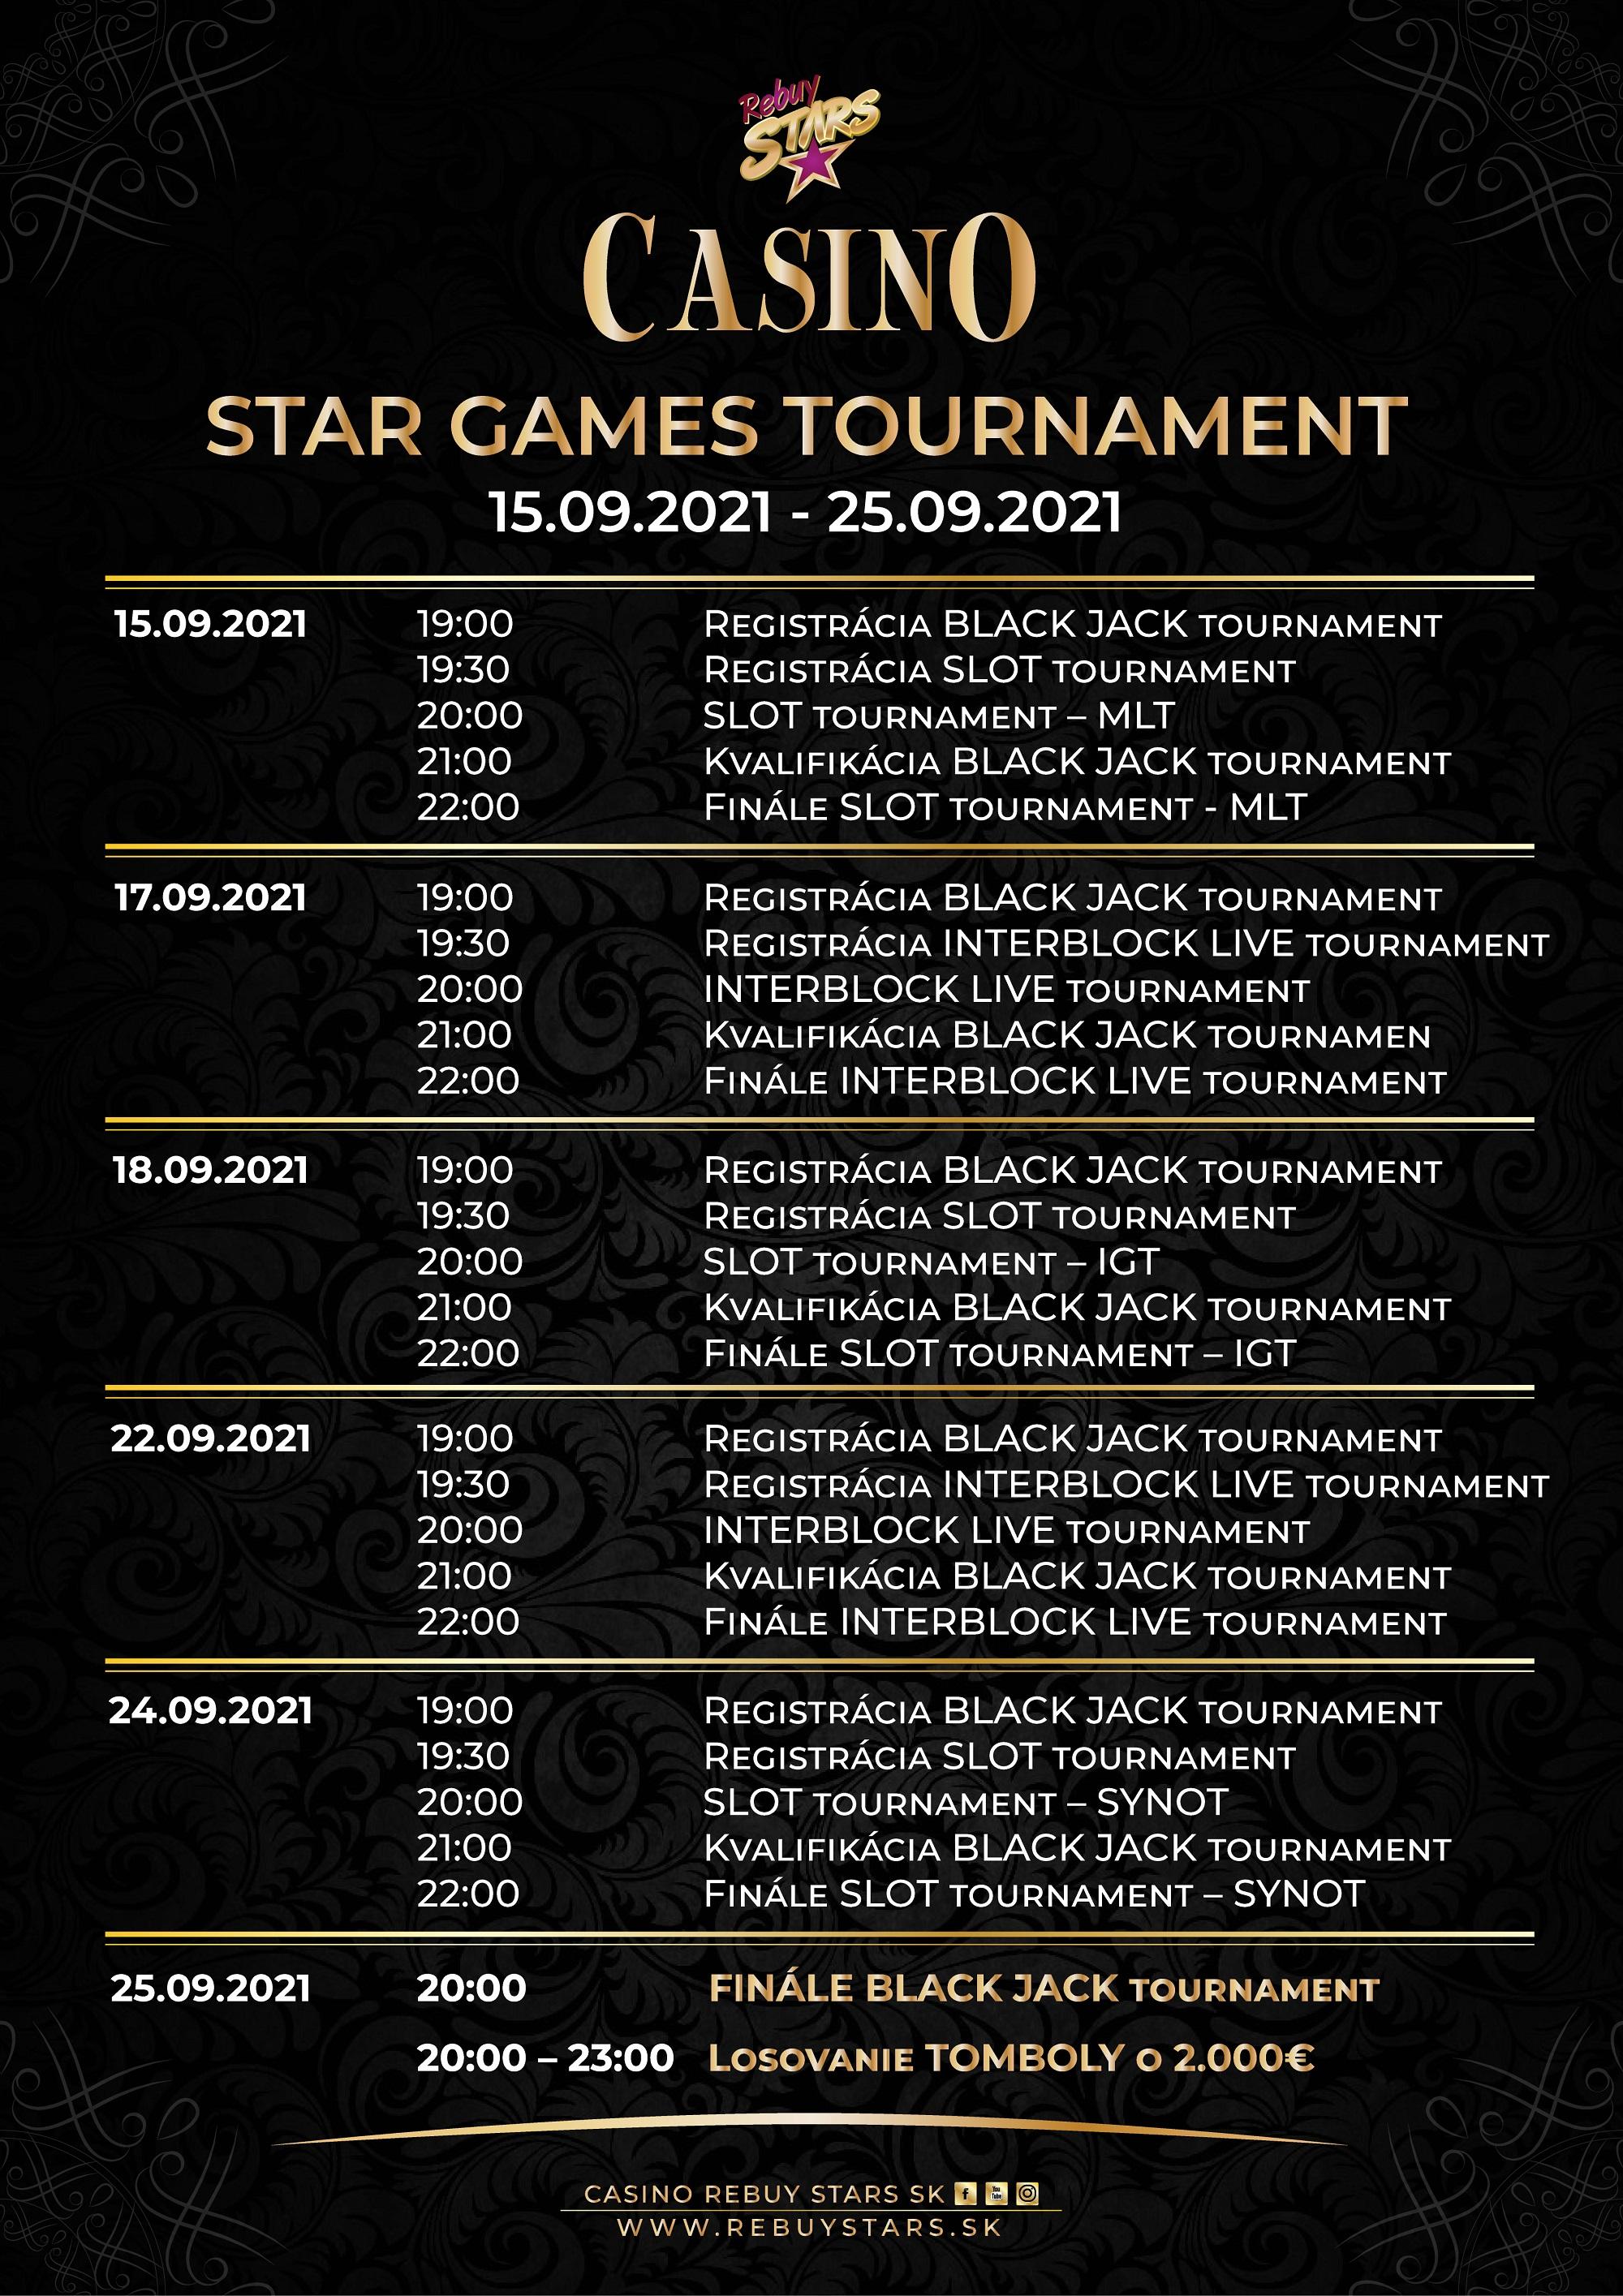 2021_09_01_Stars_Games_Tournaments_A3_program